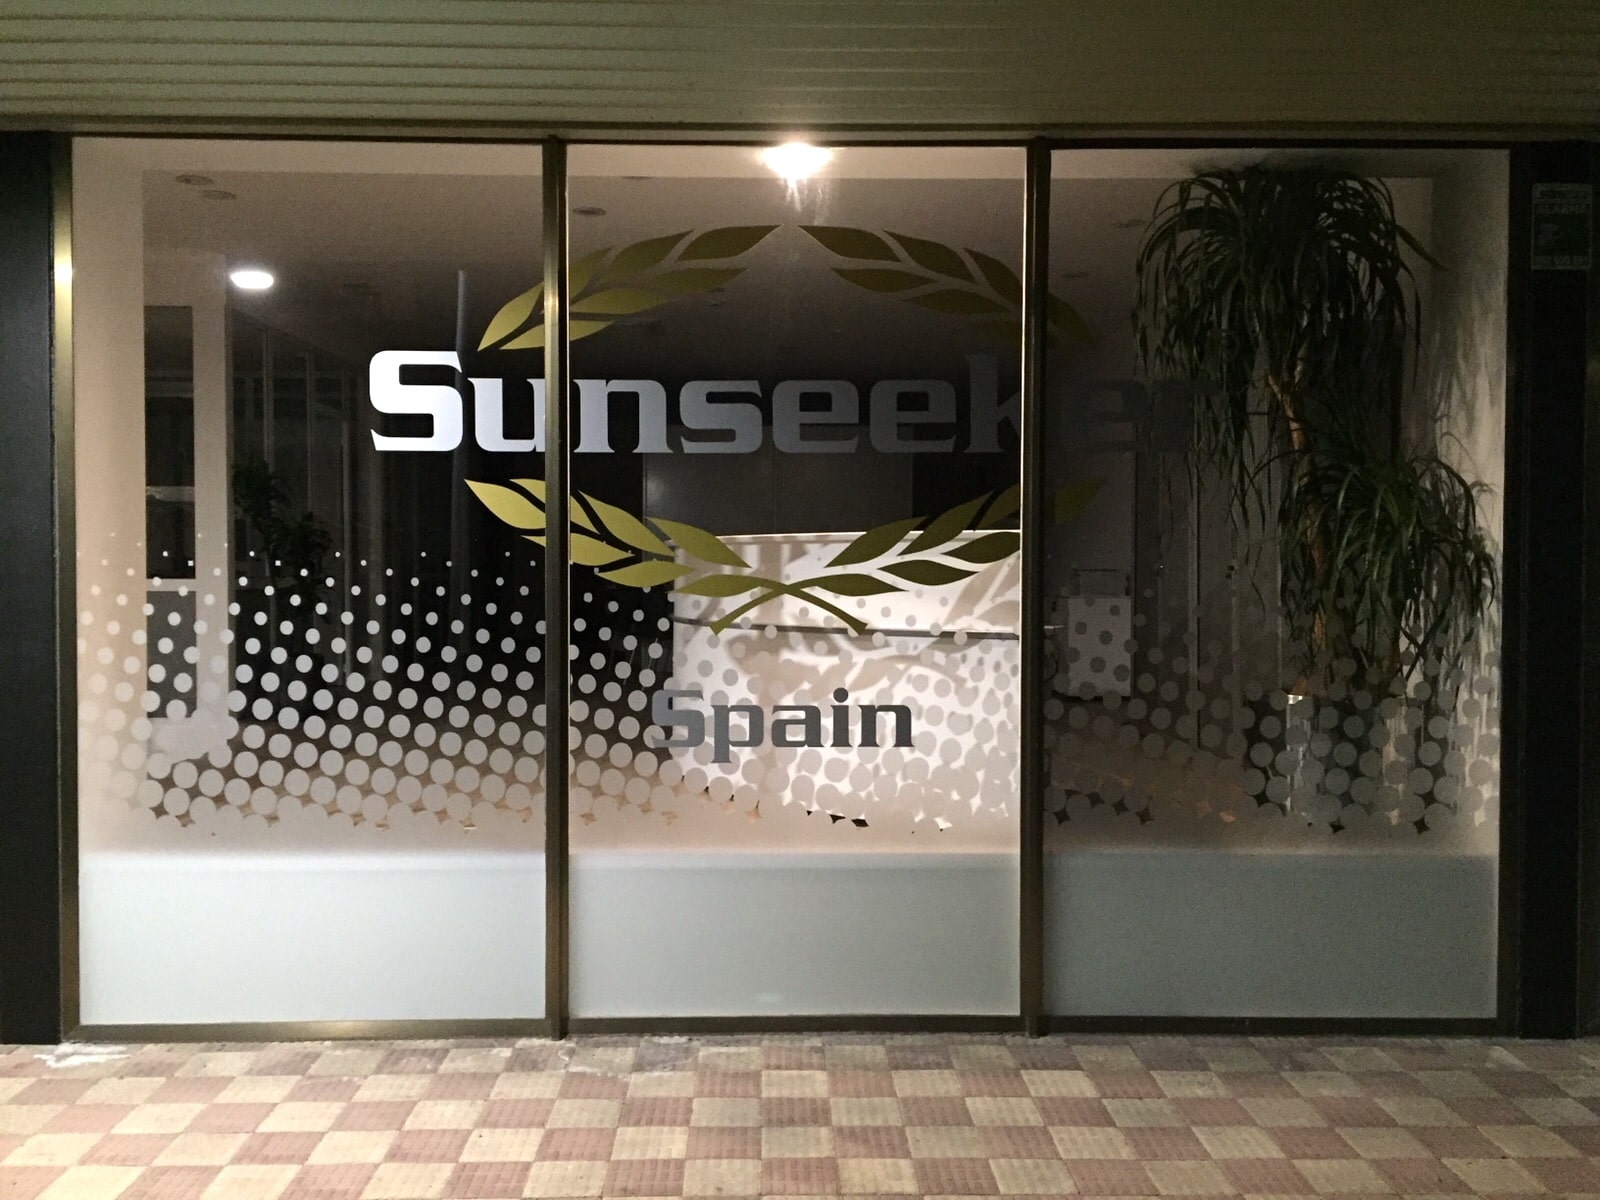 SUNSEEKER7 - Vinilos